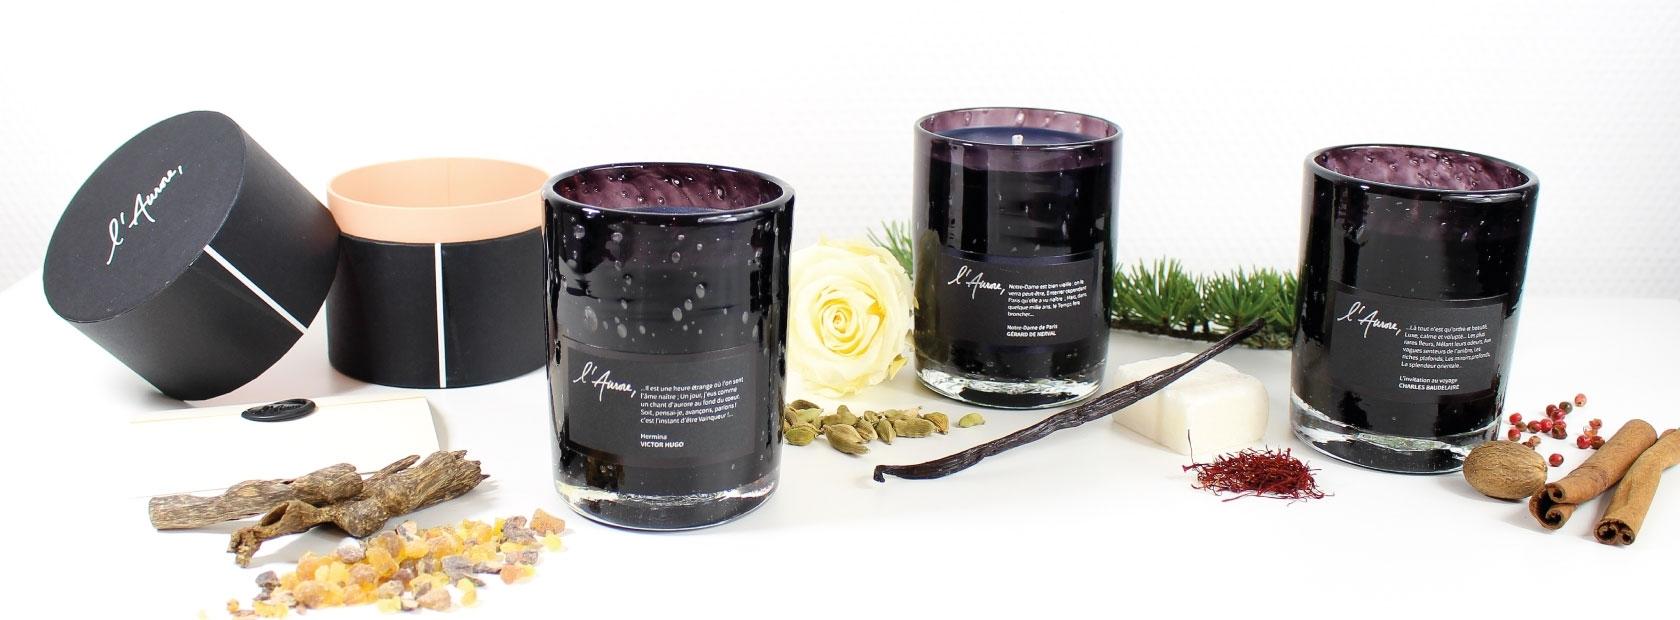 Luxury candles | L'Aurore Paris